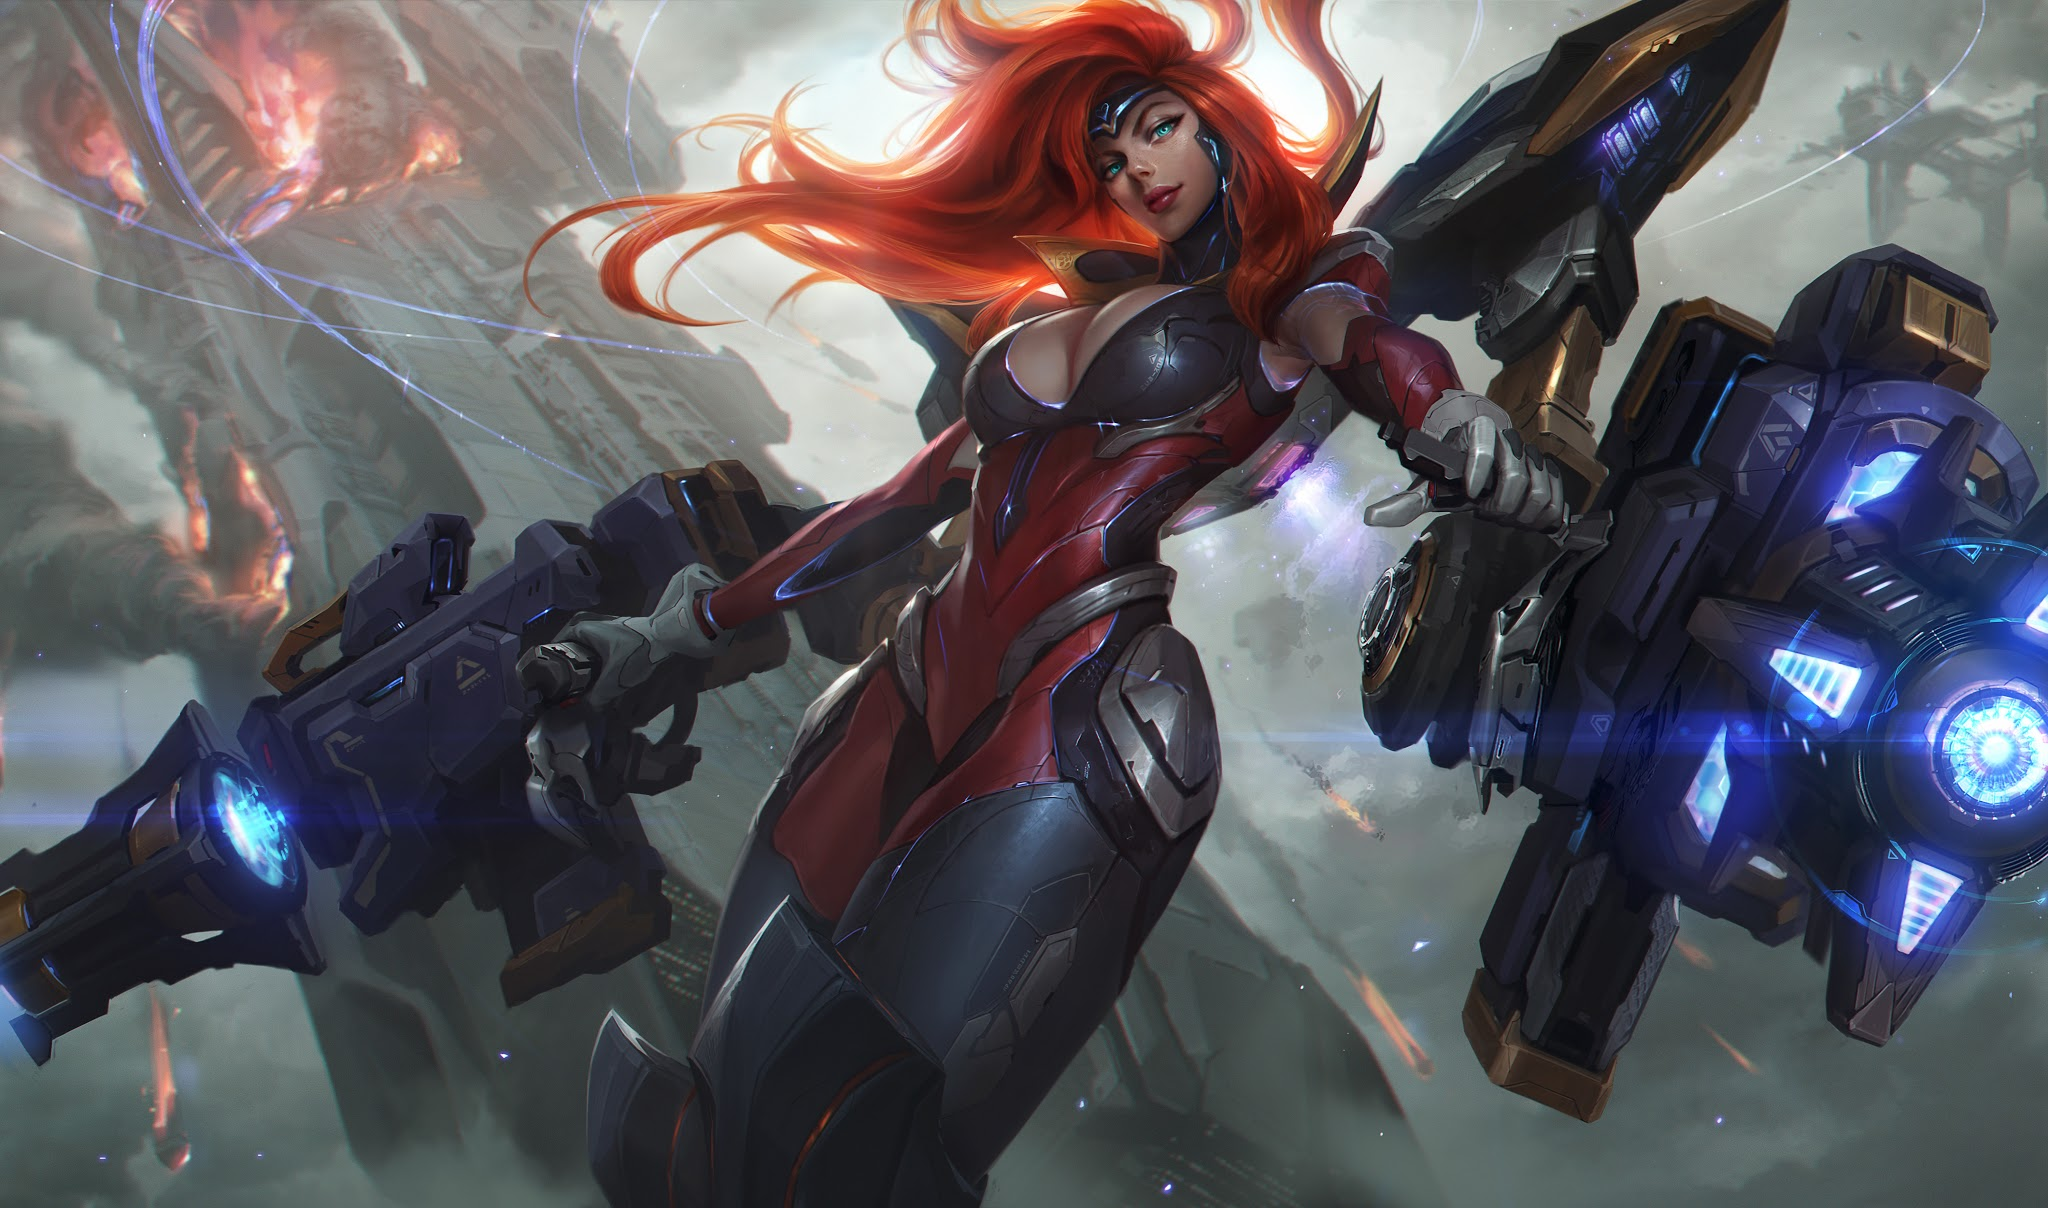 League Of Legends Miss Fortune Wallpaper: 3840x2160 Miss Fortune League Of Legends HD 4k HD 4k